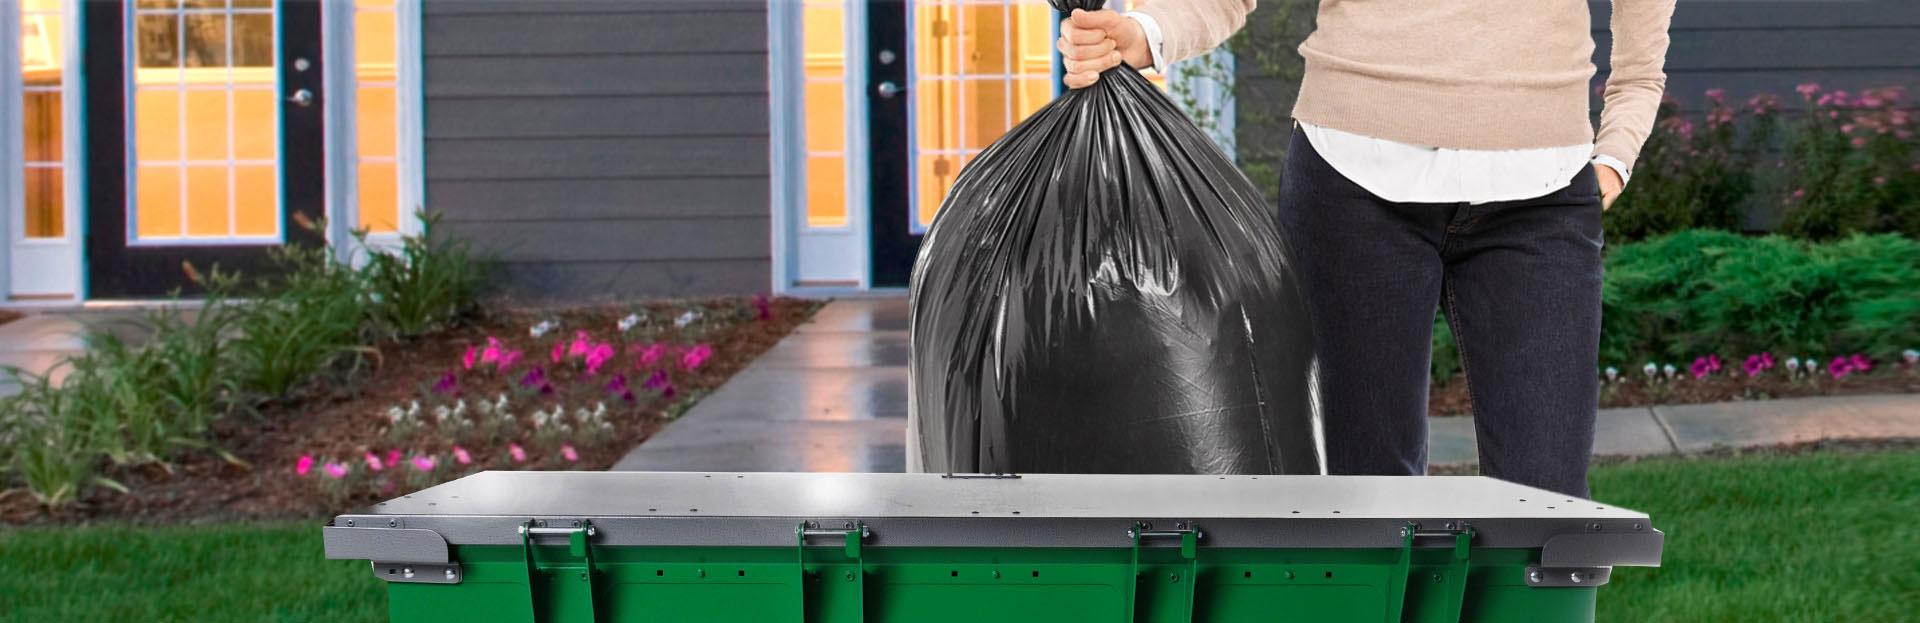 Residential Garbage Bins